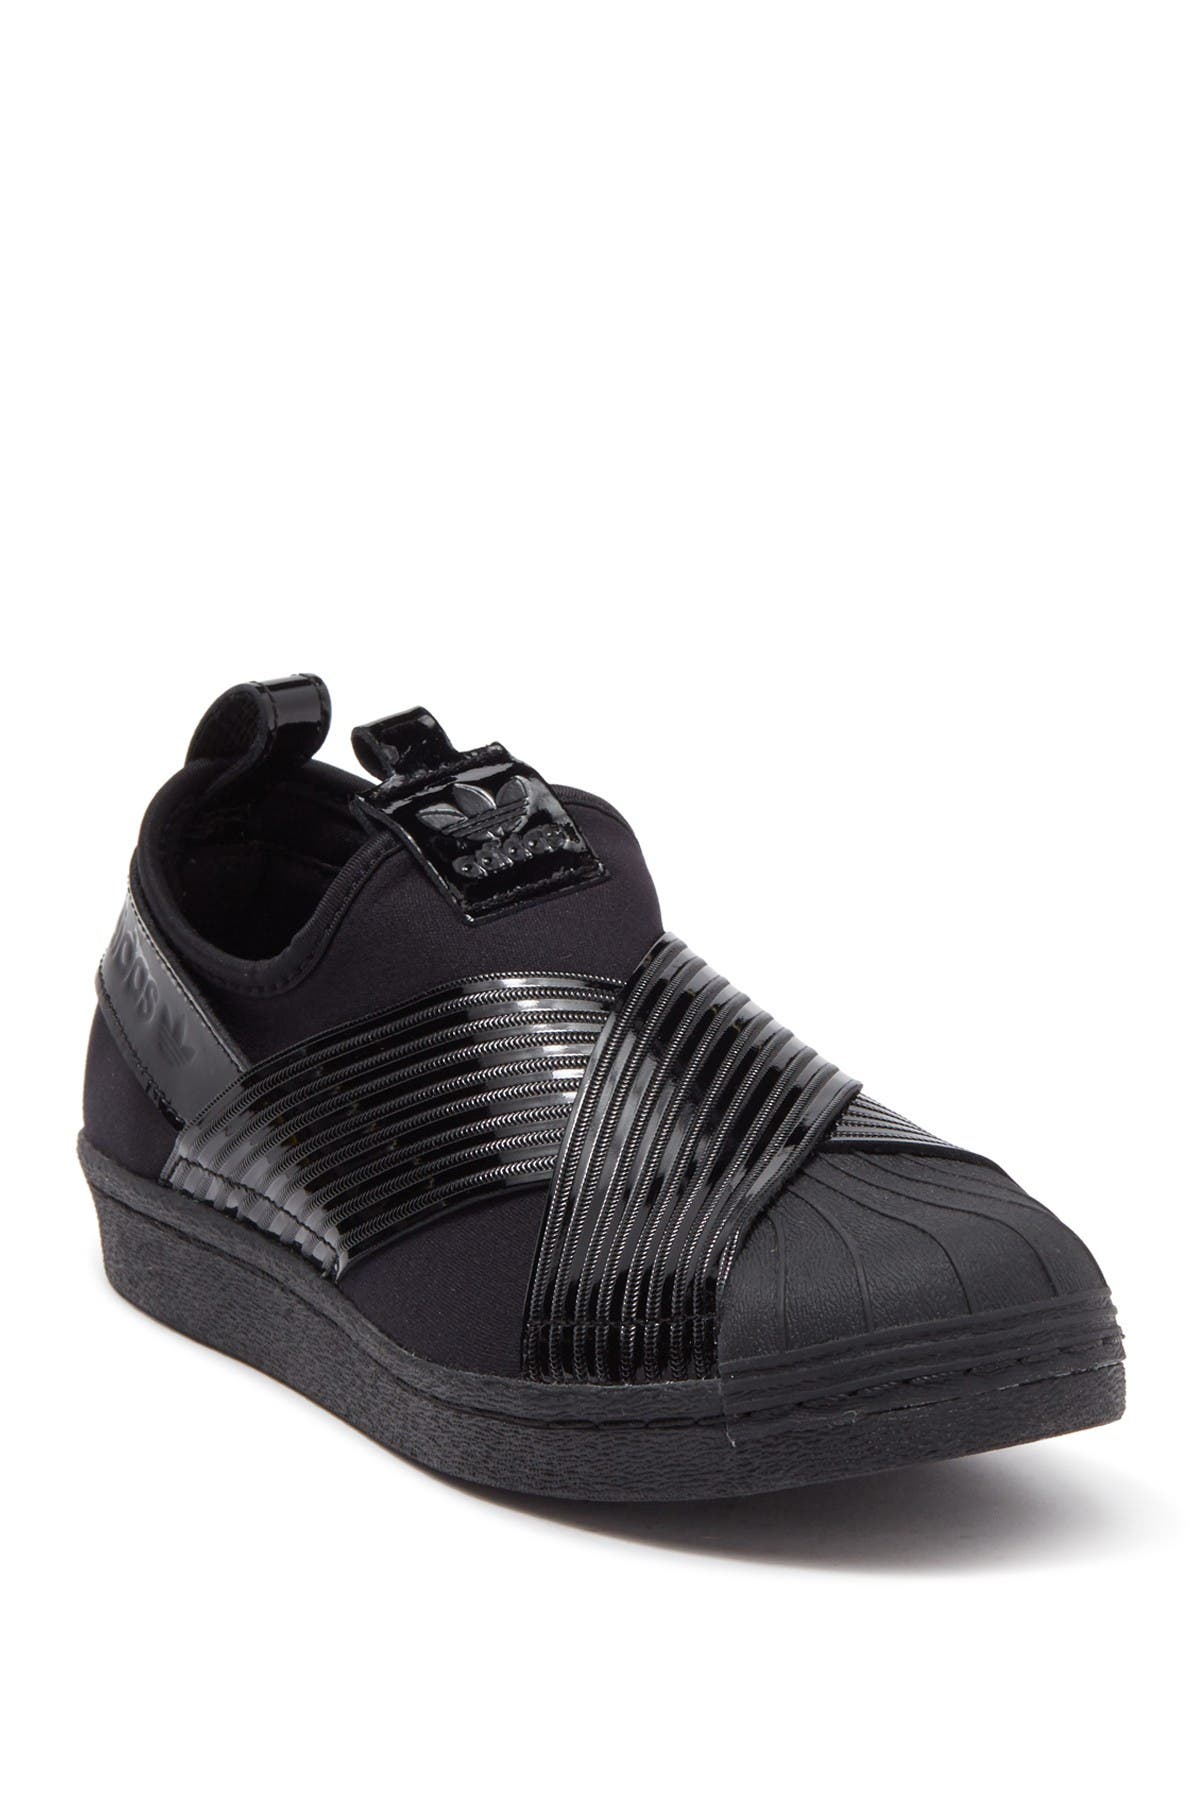 Image of adidas SuperStar Slip-On Sneaker